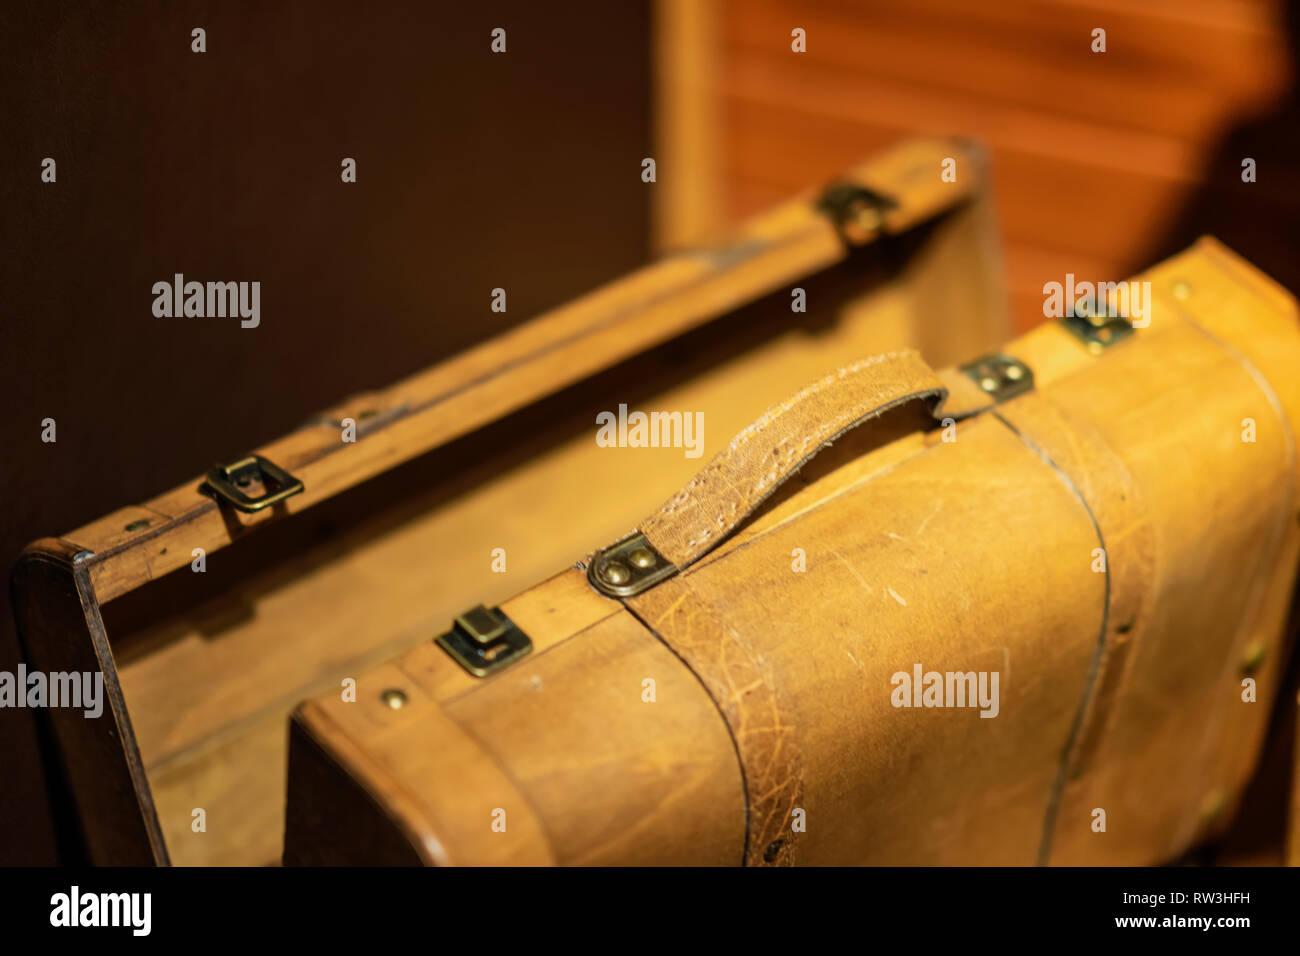 Yellow wooden suitcase for travel closeup, nostalgic luggage, vintage background - Stock Image